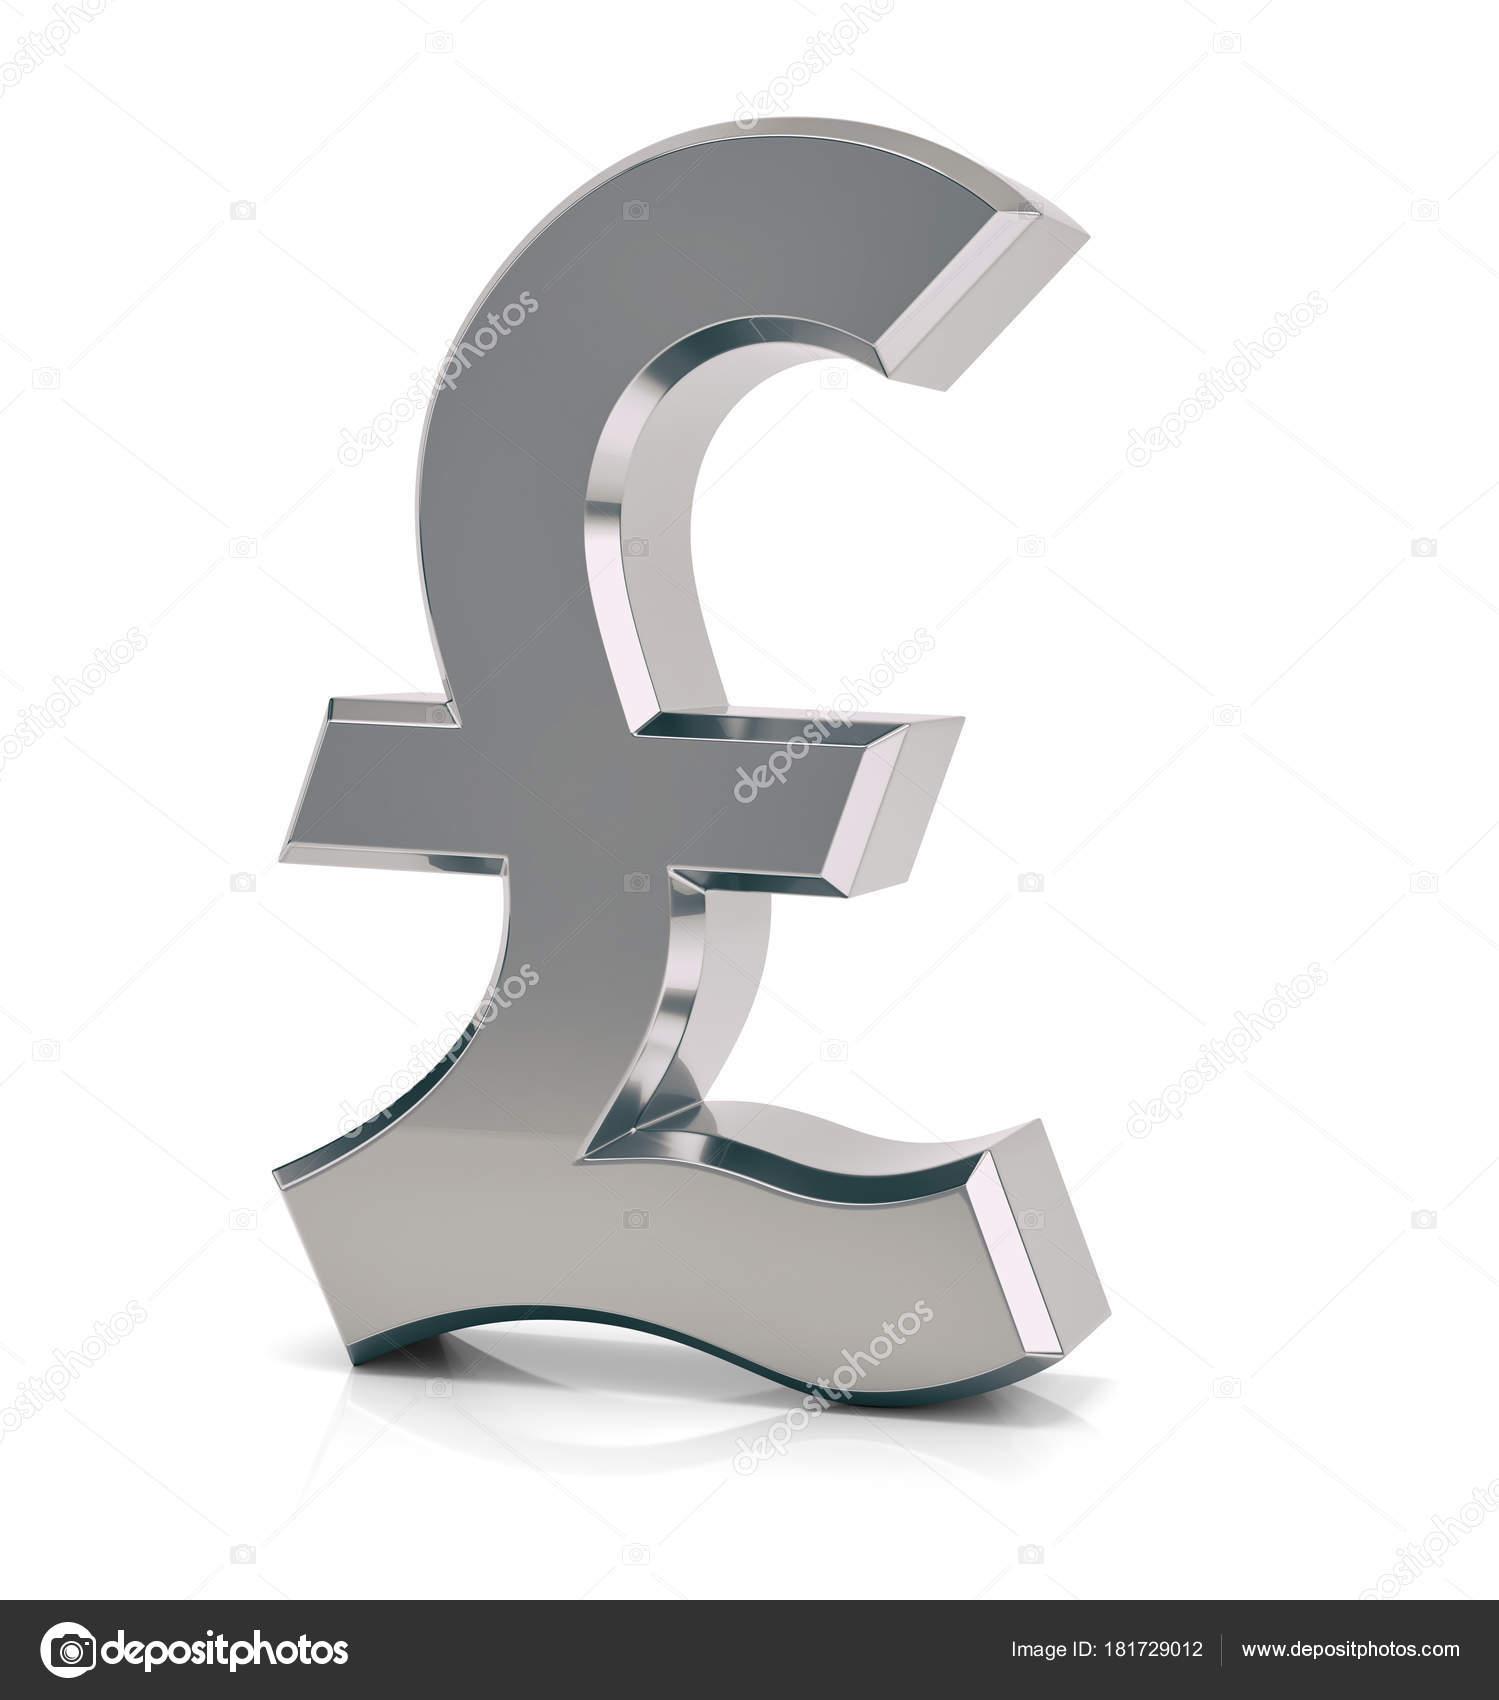 British Pound Sign Symbol Stock Photo Md3d 181729012